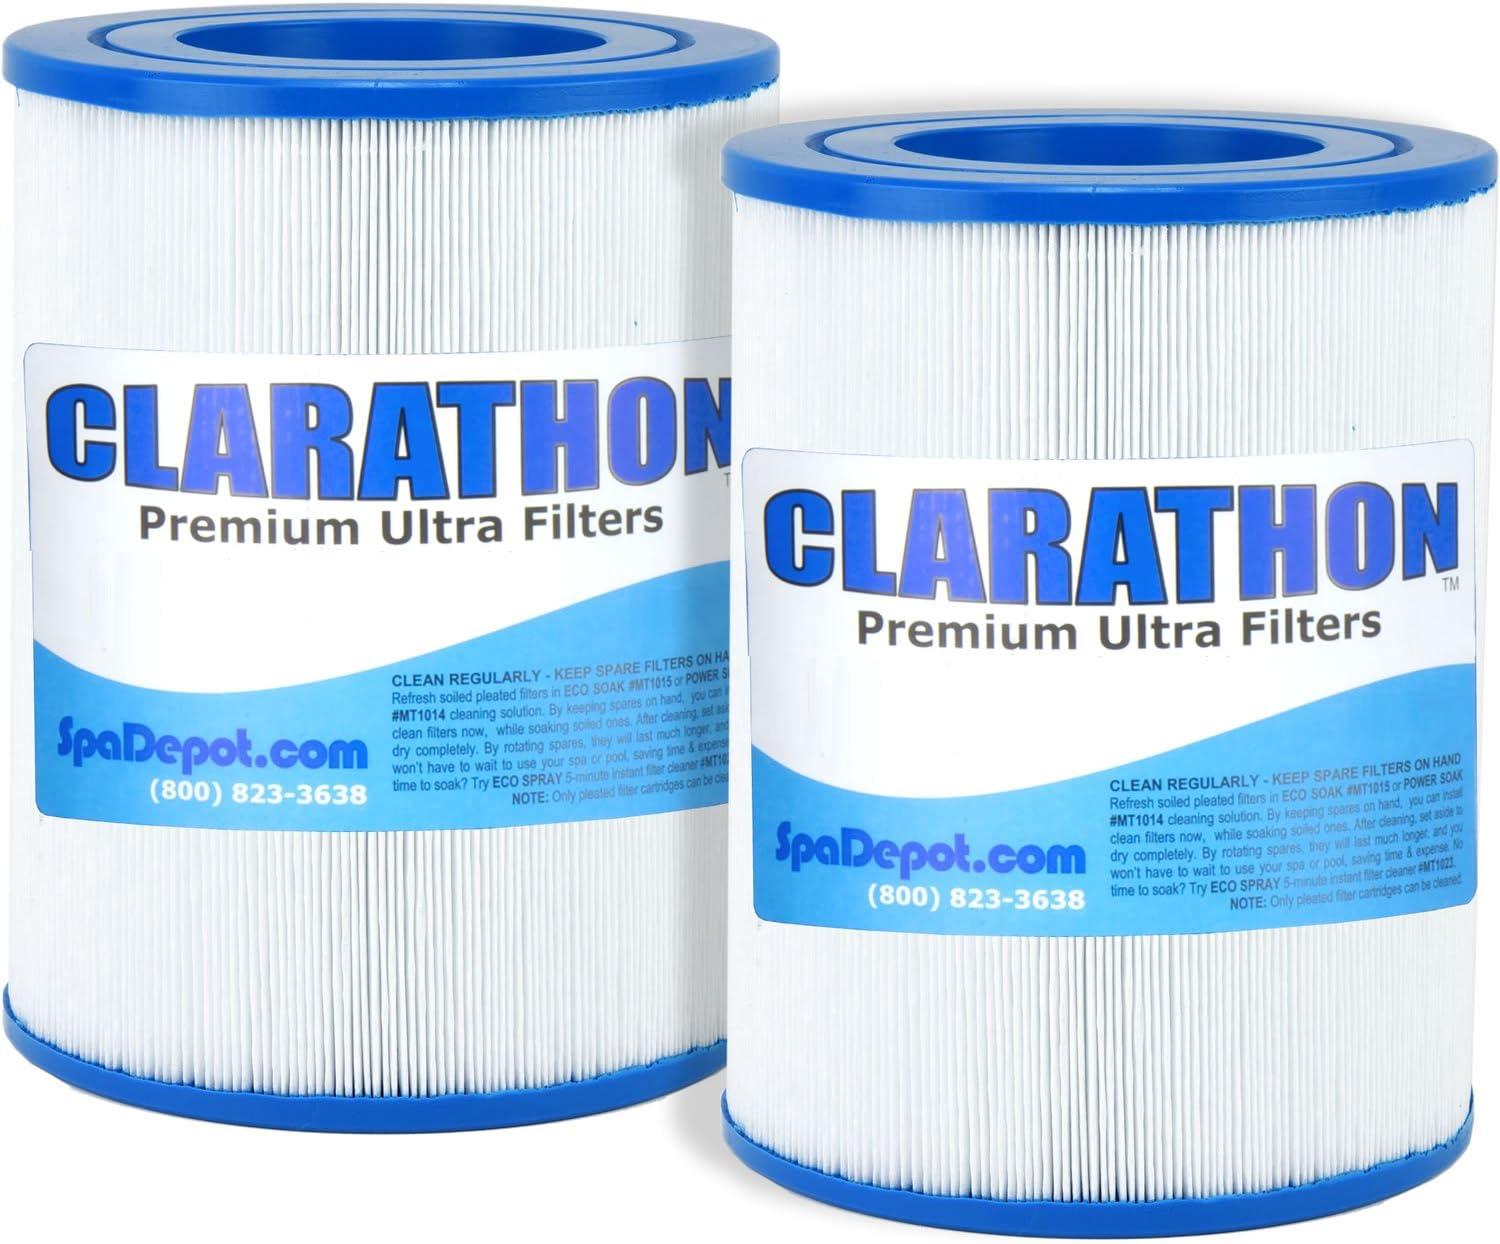 [2] AquaRest / Dream Maker Hot Tub Spa Filters (Round Cartridge) Aqua Rest Twin Pack by Clarathon